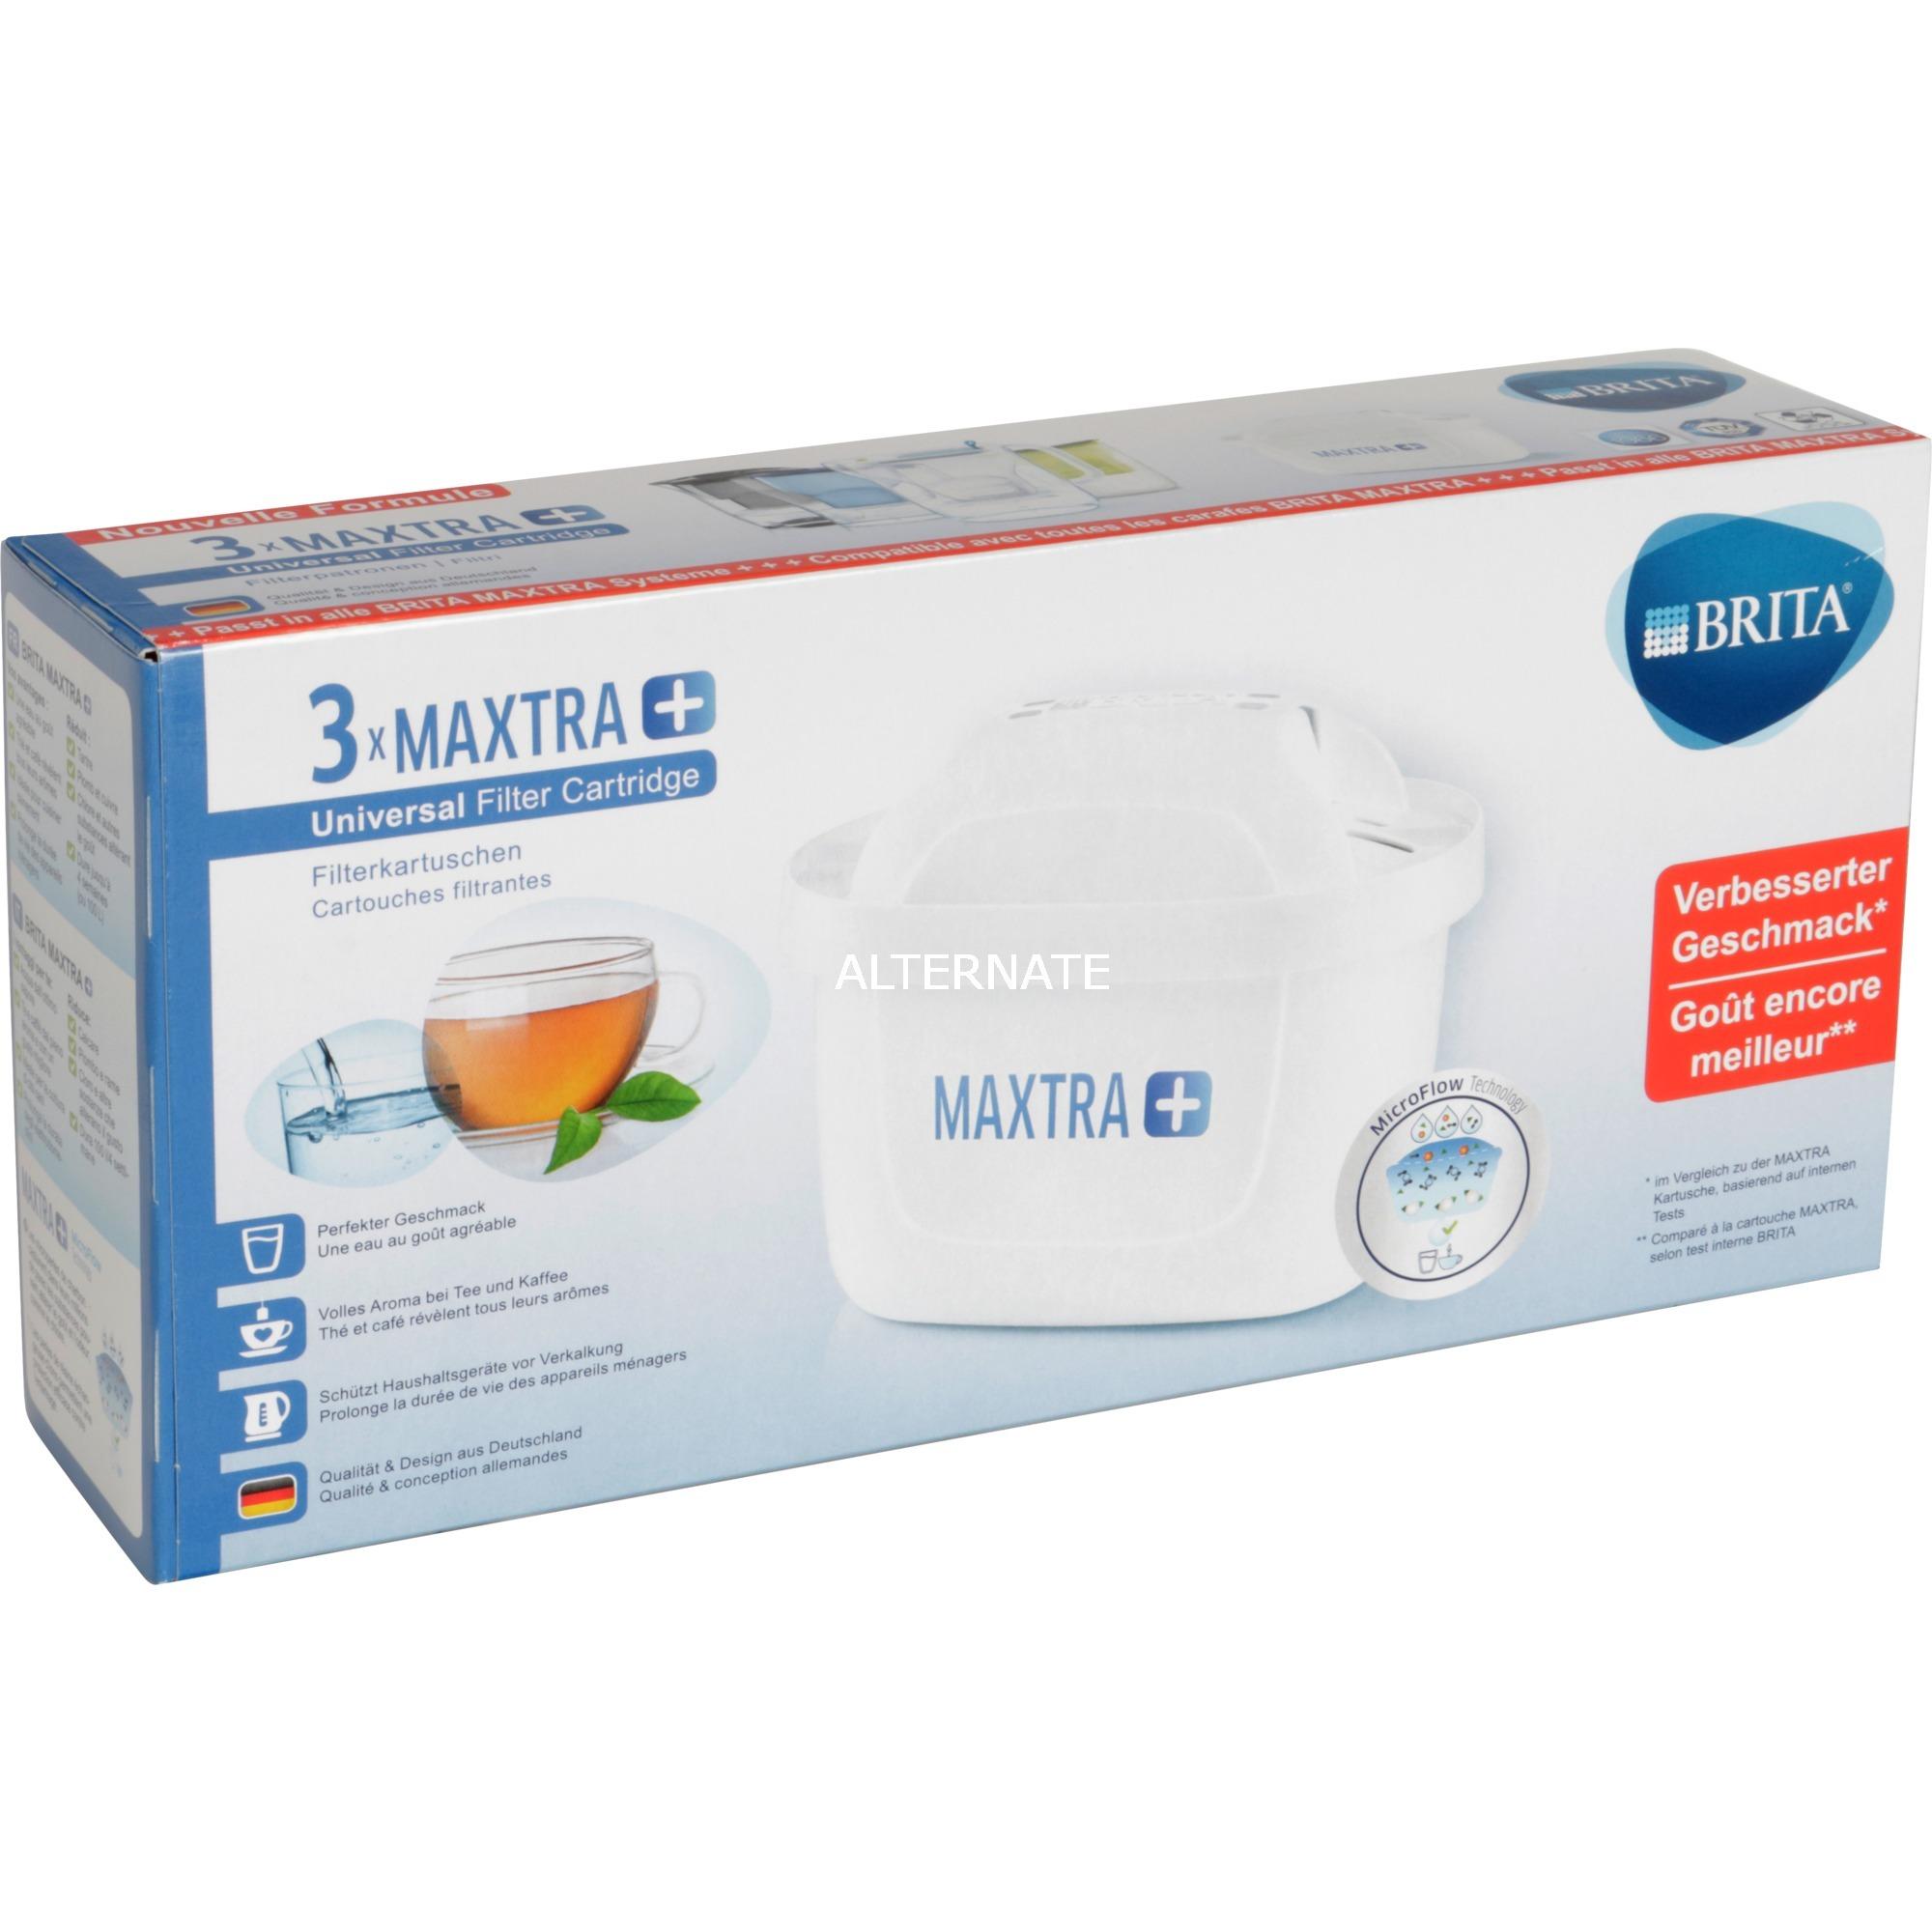 1023120 Cartucho 3pieza(s) suministro de filtro de agua, Filtro para agua potable